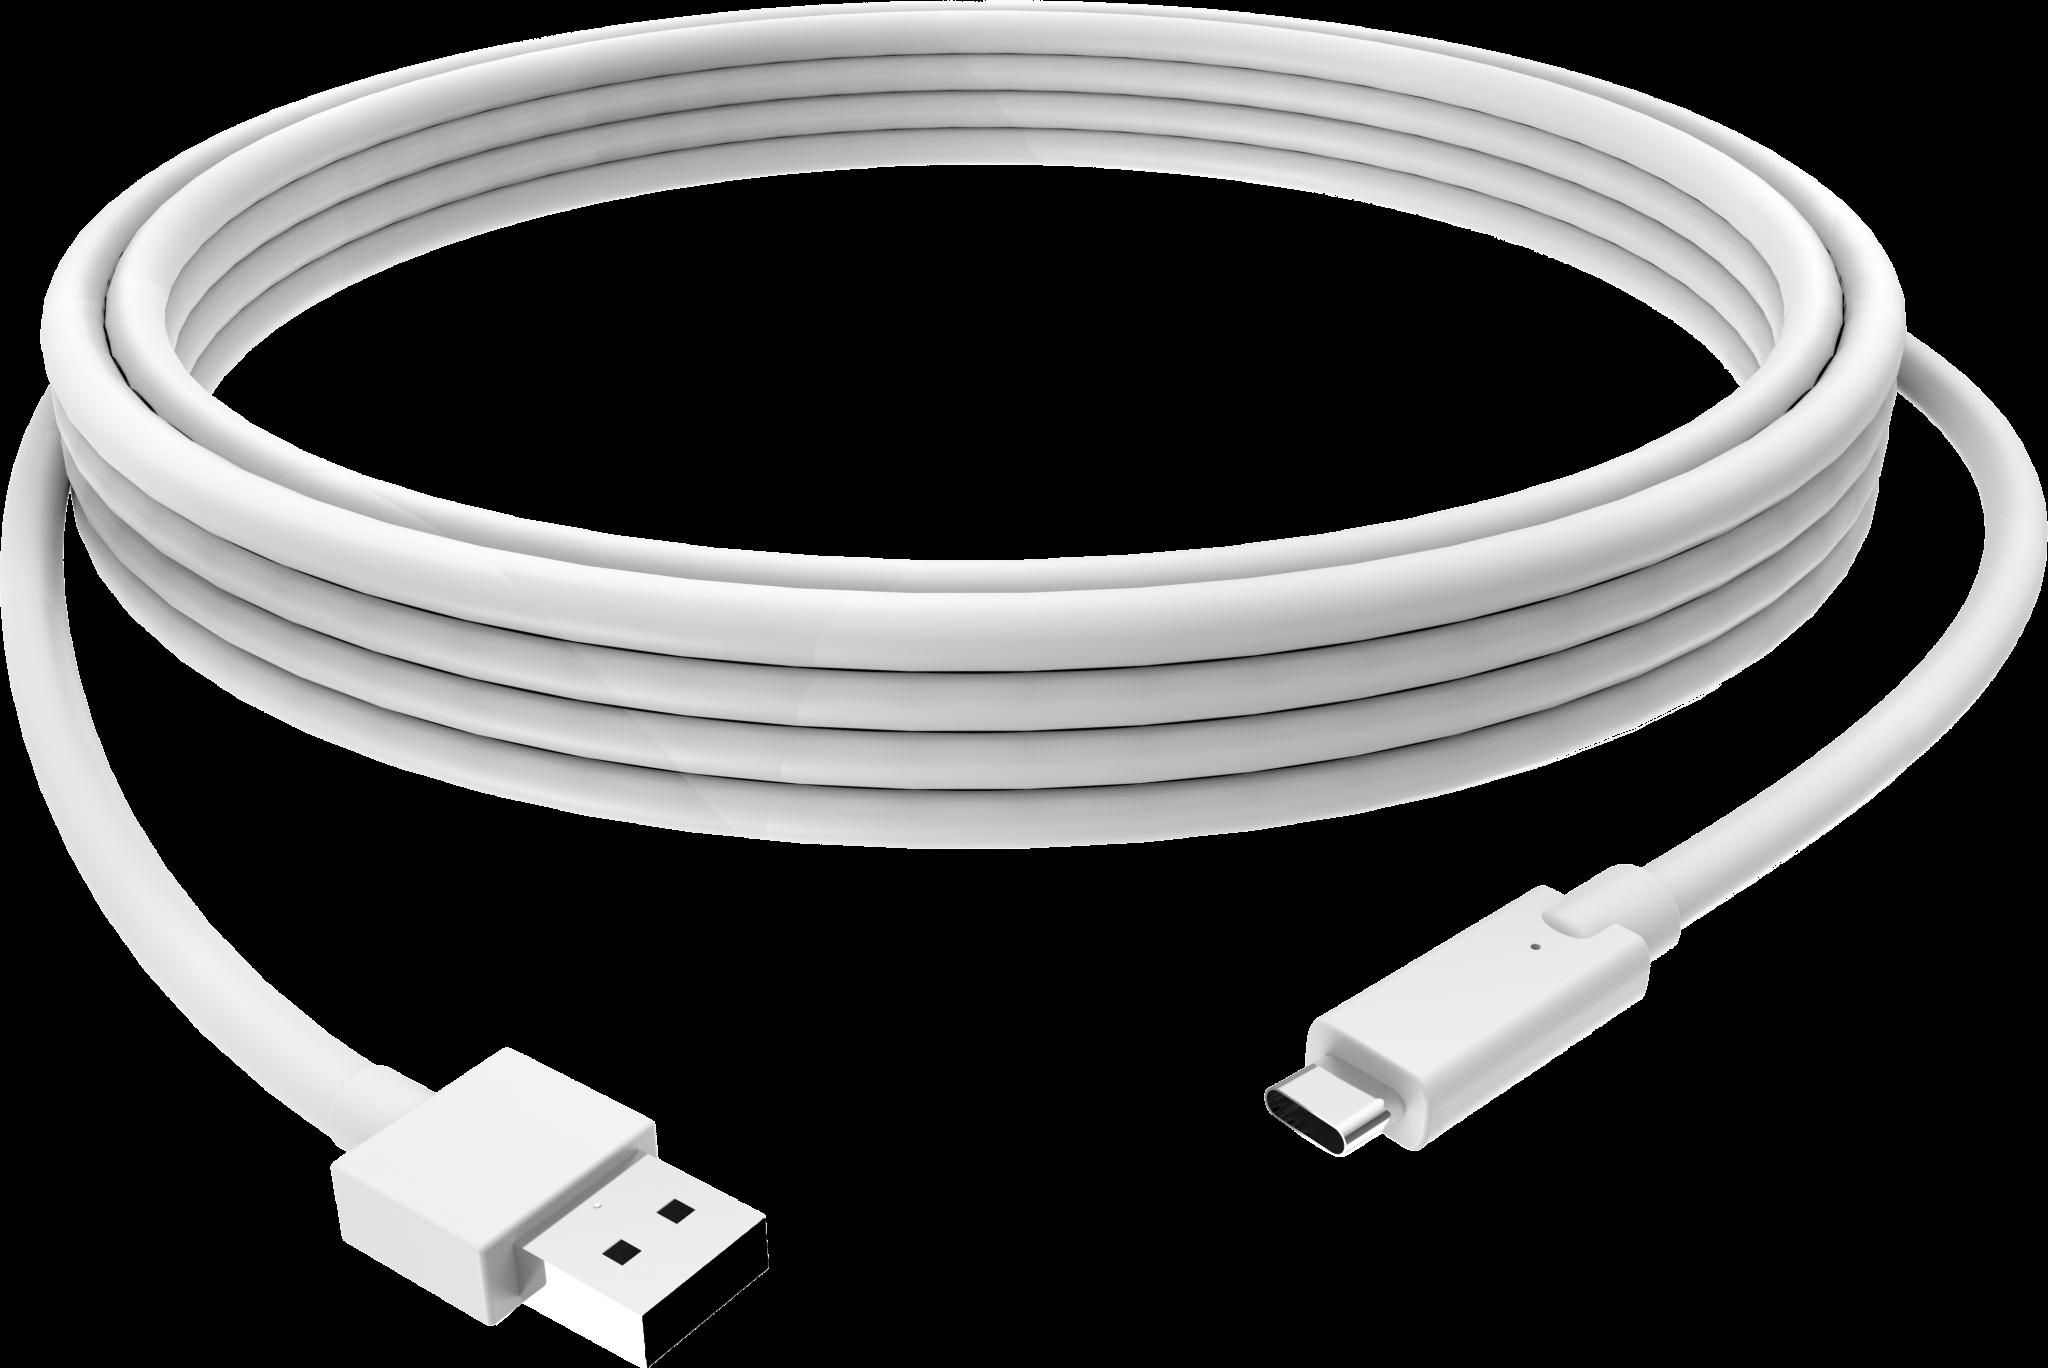 USB-C Cable & Adaptors - VISION Pro AV Products